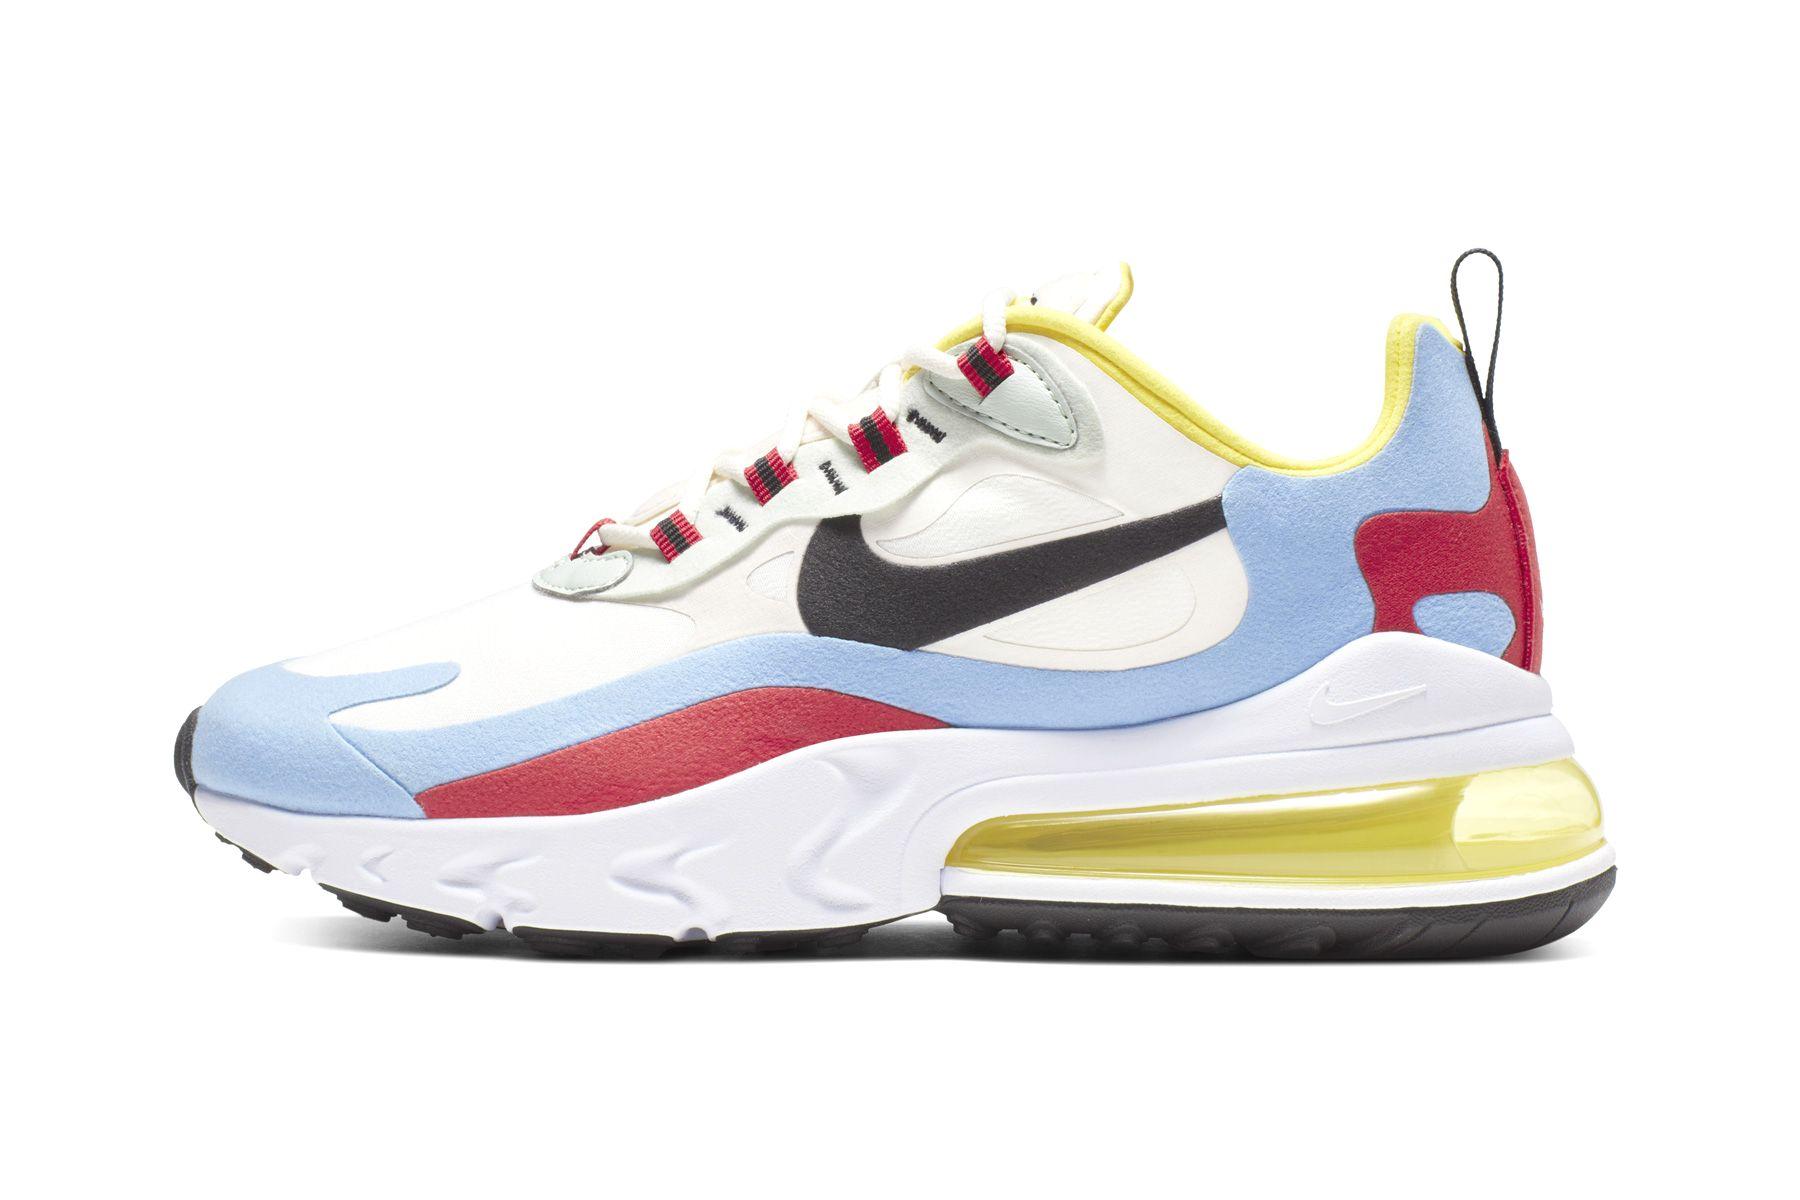 Nike Air Max 270 React - все о релизе нового силуэта